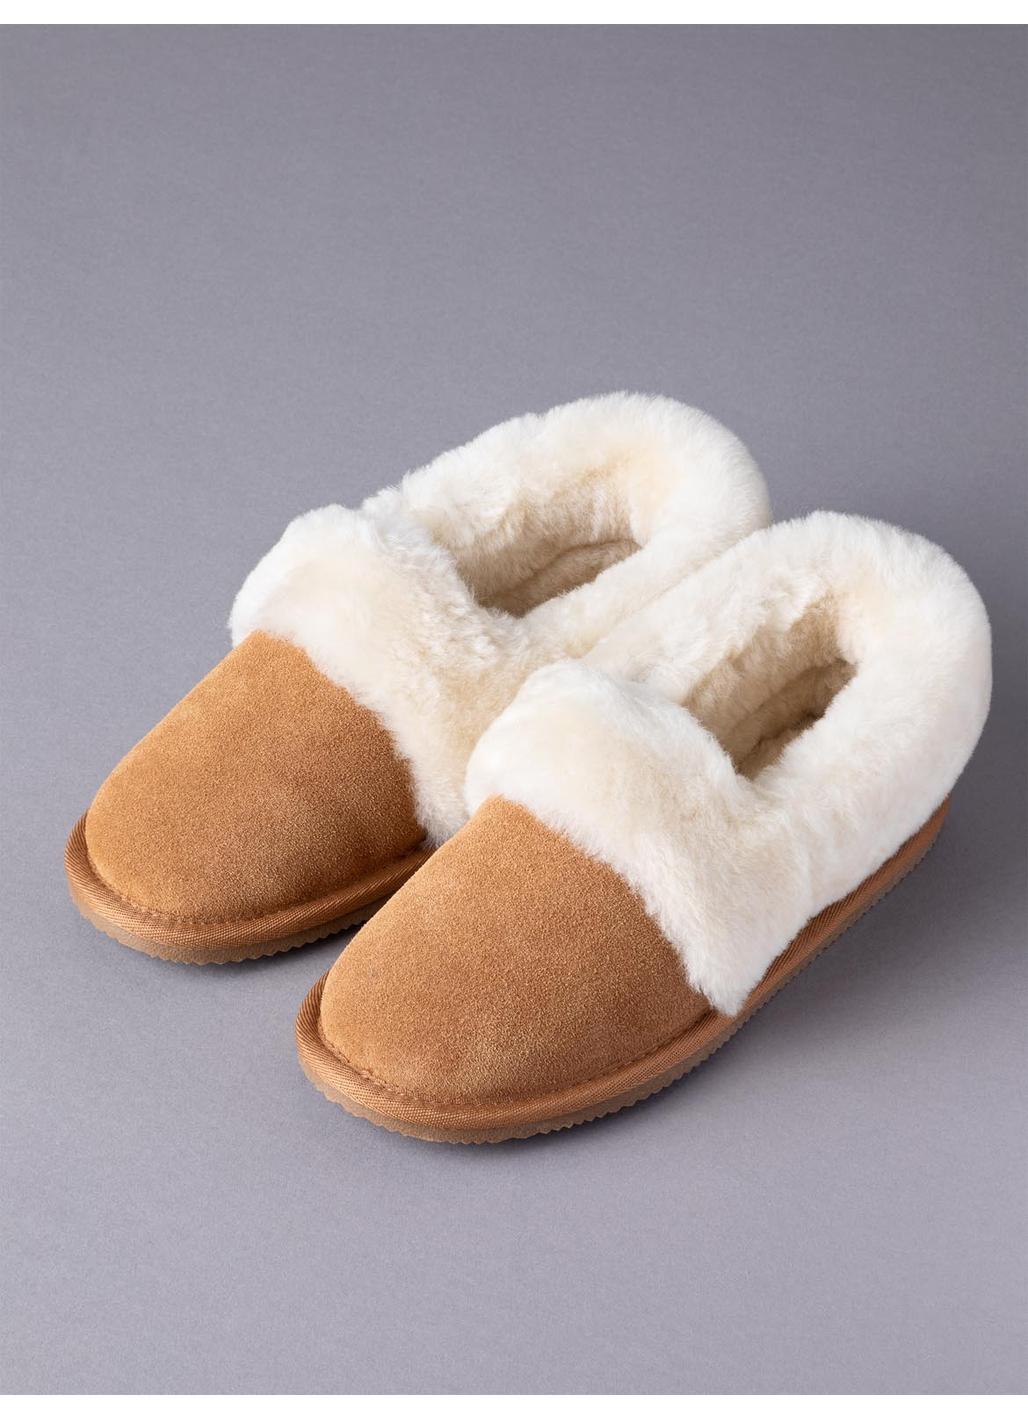 Ladies' Sheepskin Cuff Slippers in Tan